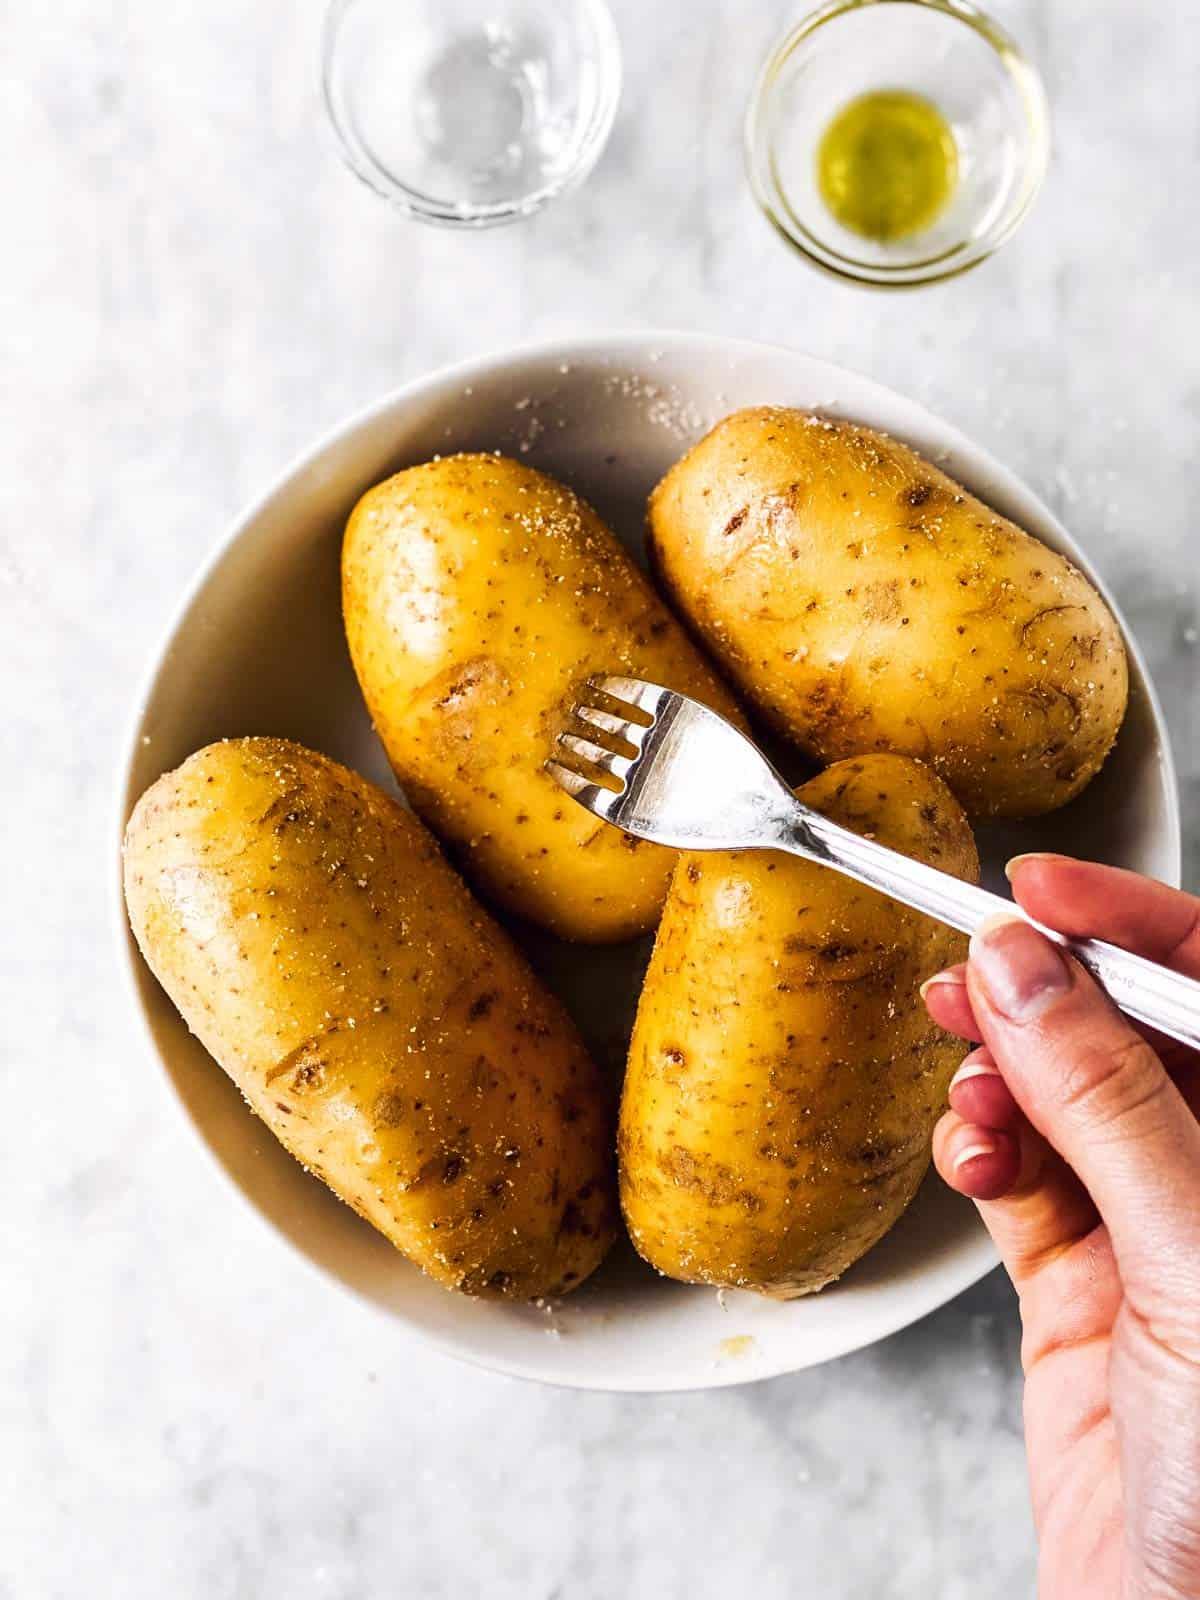 fork pricking a russet potato